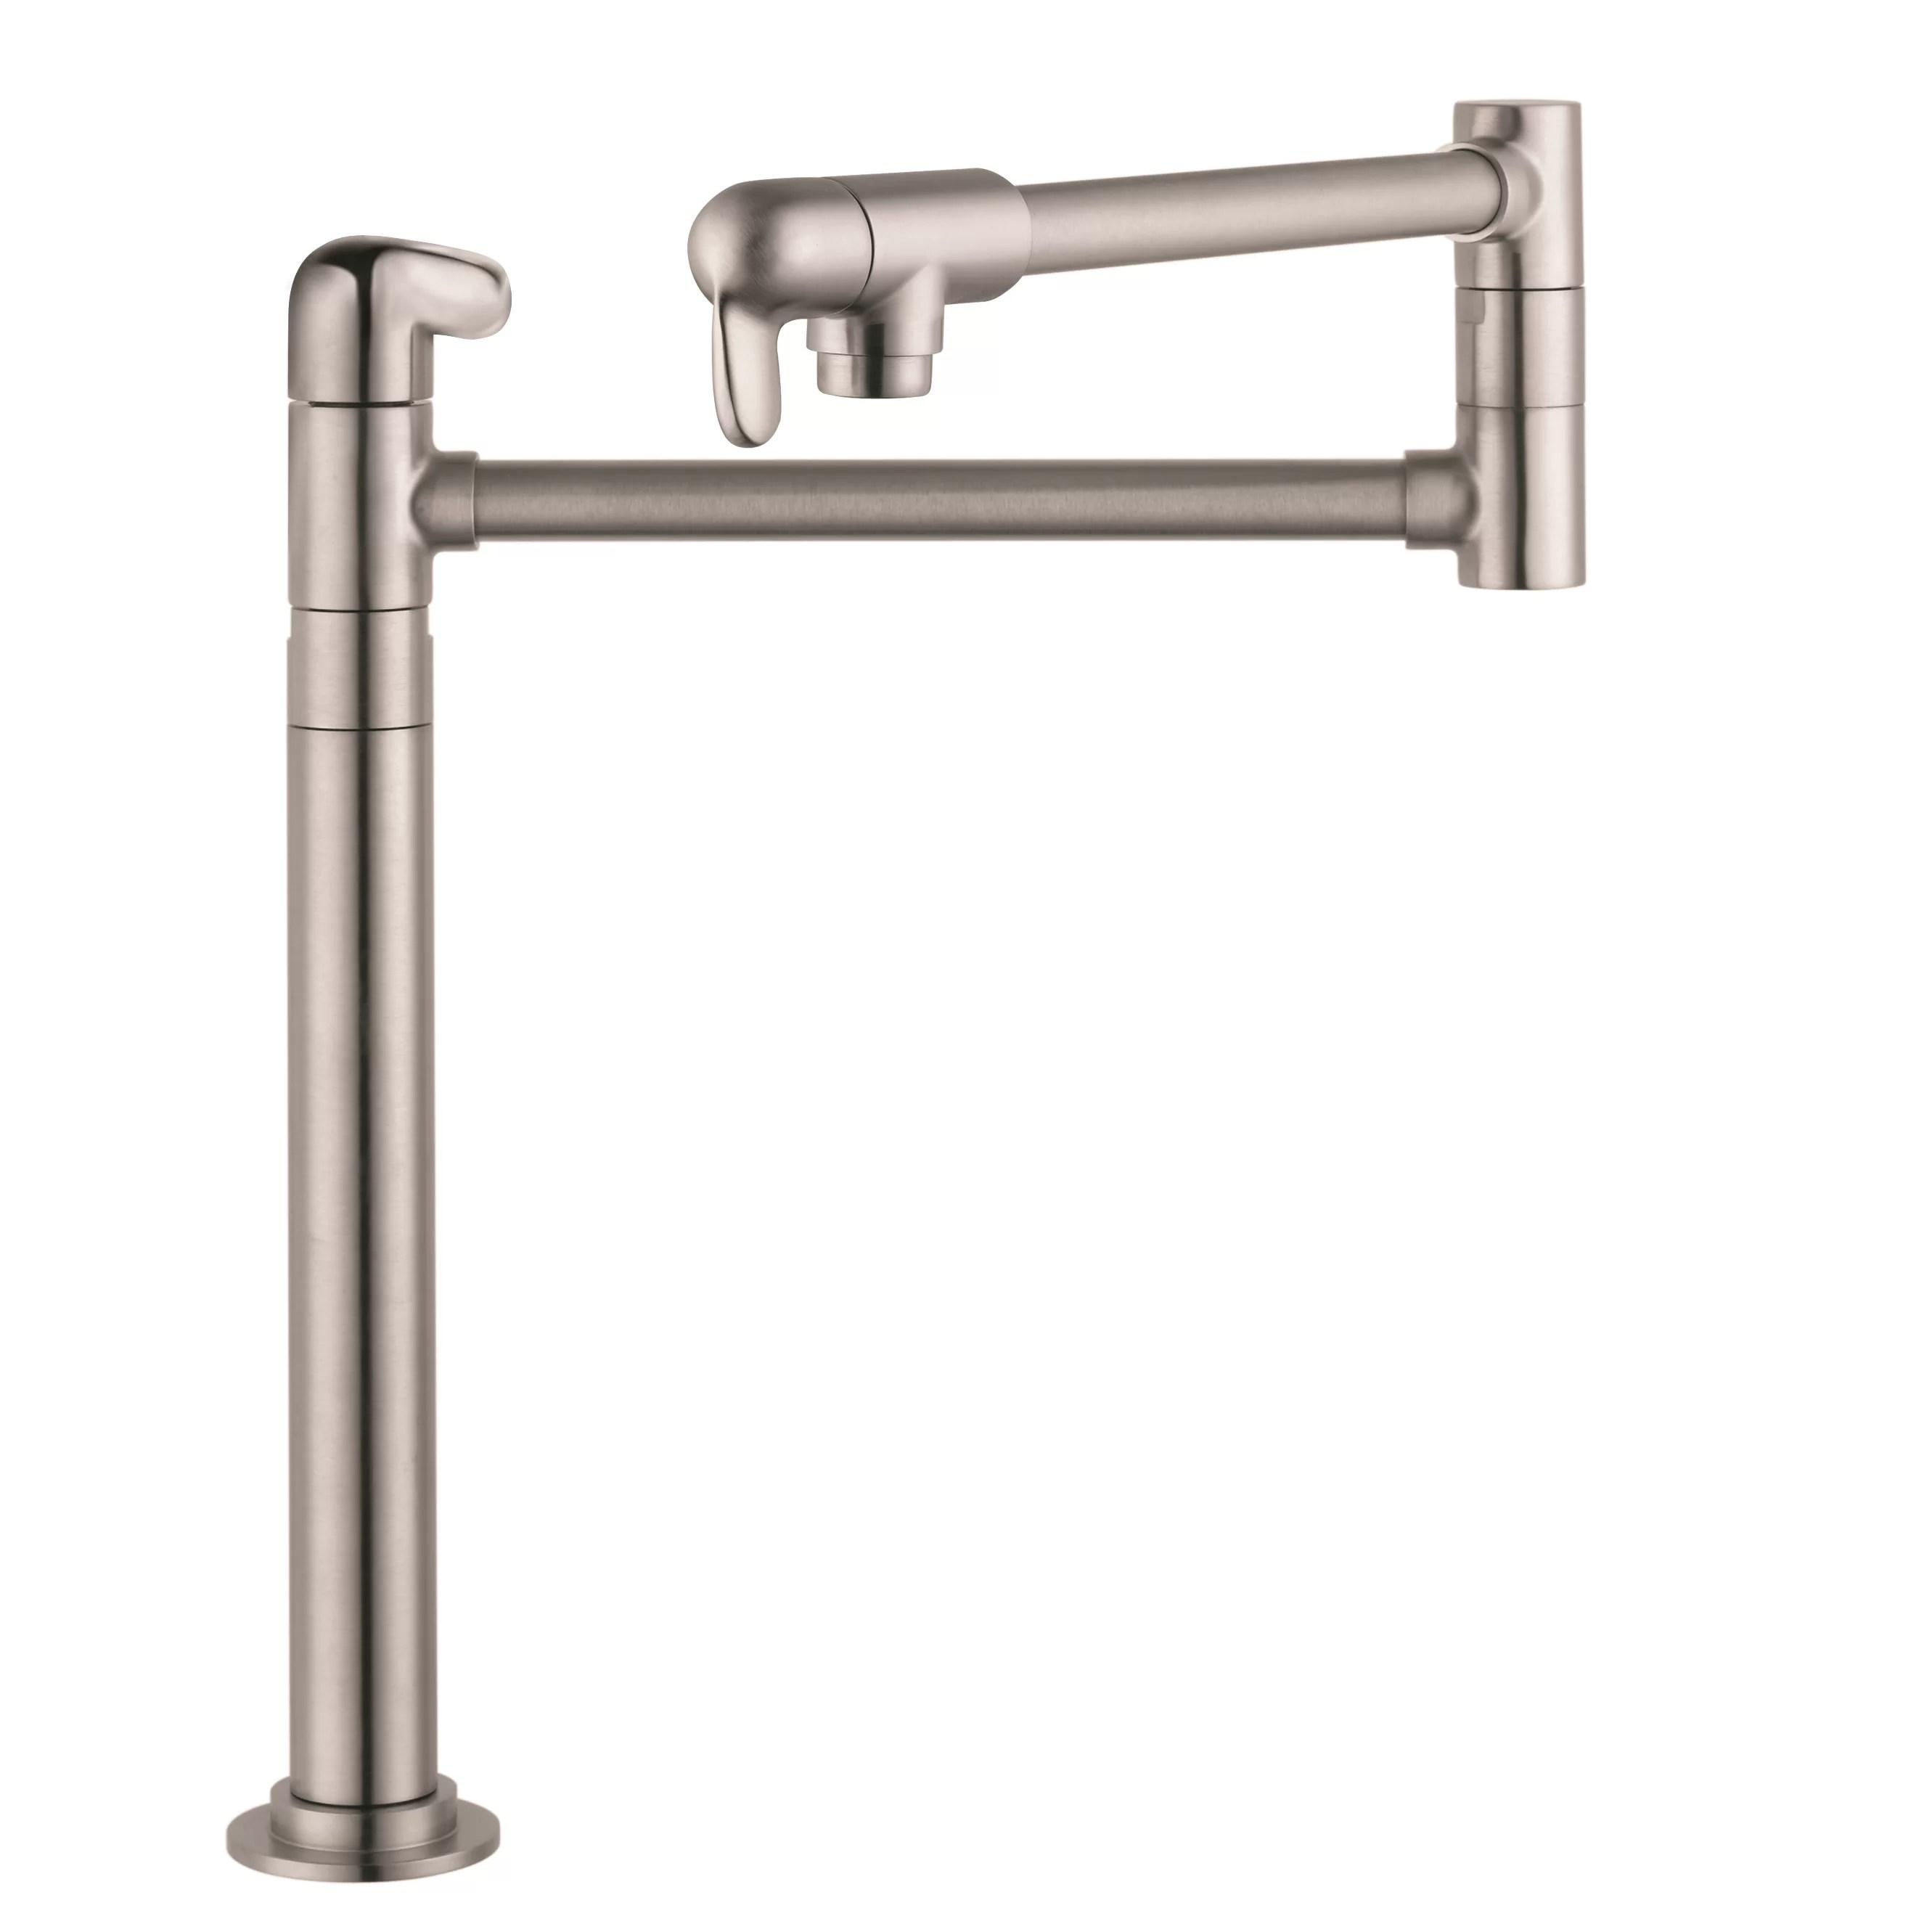 hansgrohe allegro e kitchen faucet coffee signs decor single handle deck mounted pot filler